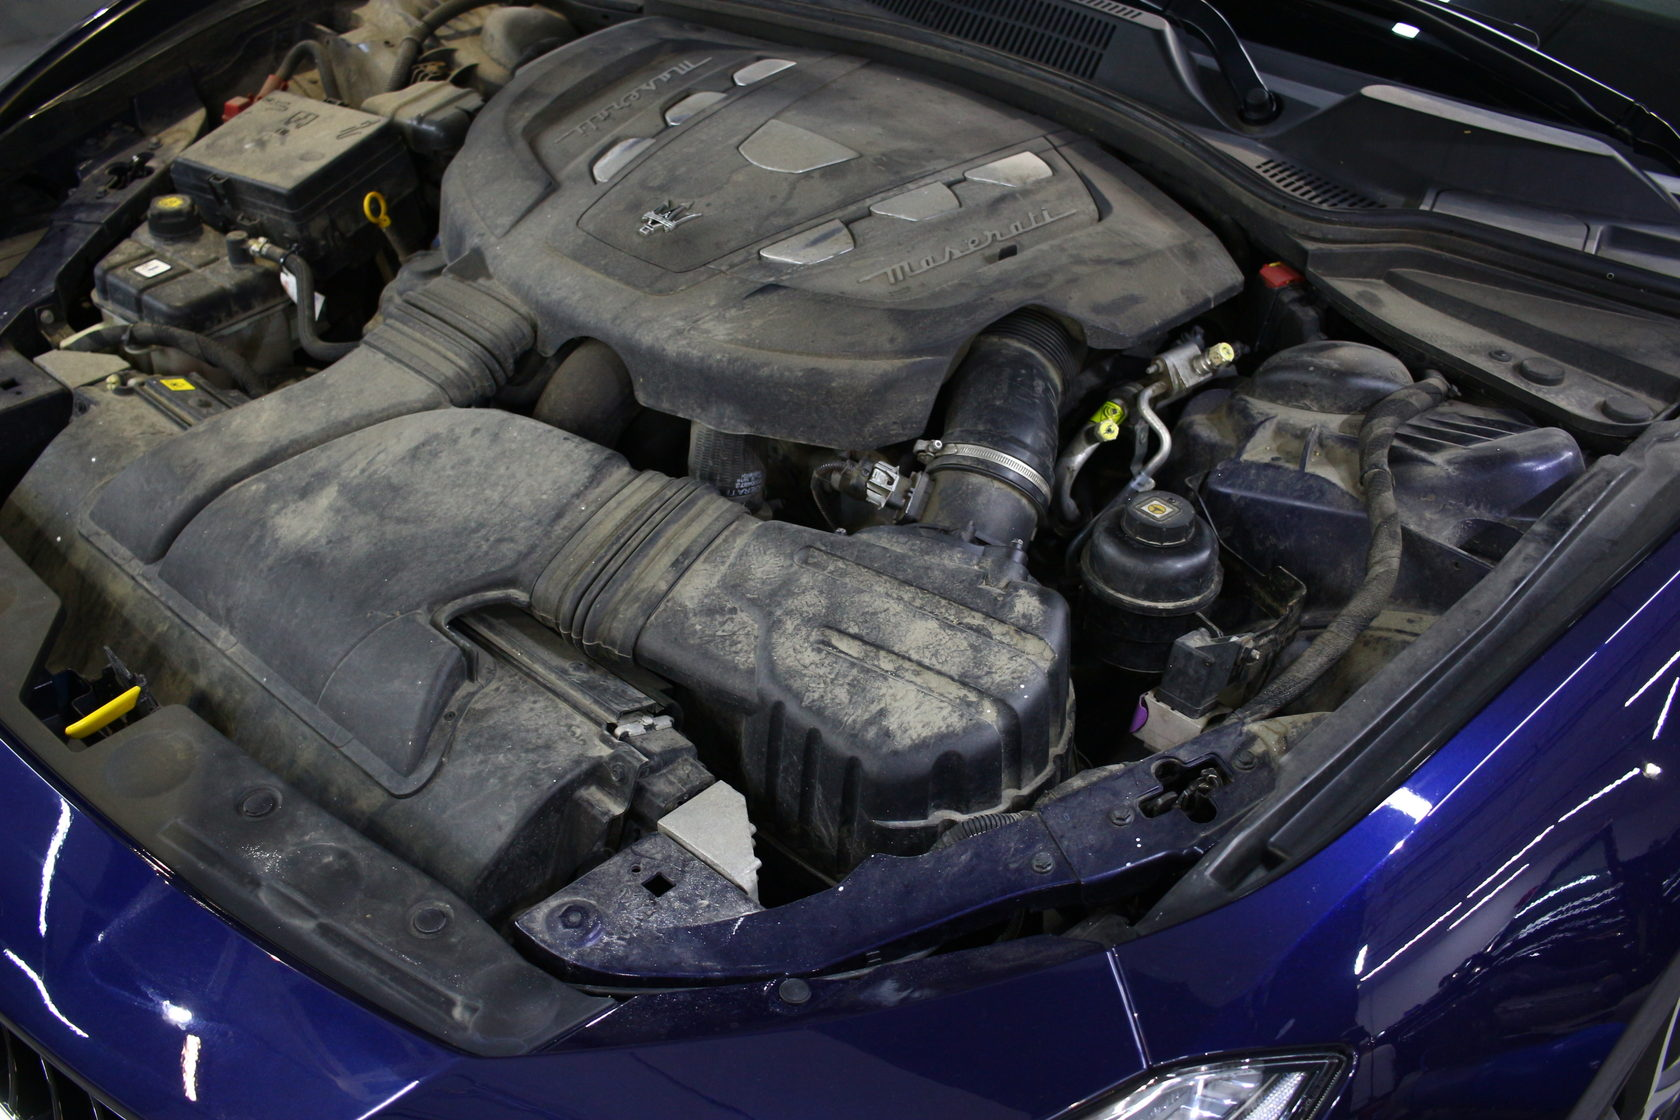 Мойка мотора, мойка двигателя, meserati, детейлинг мотора